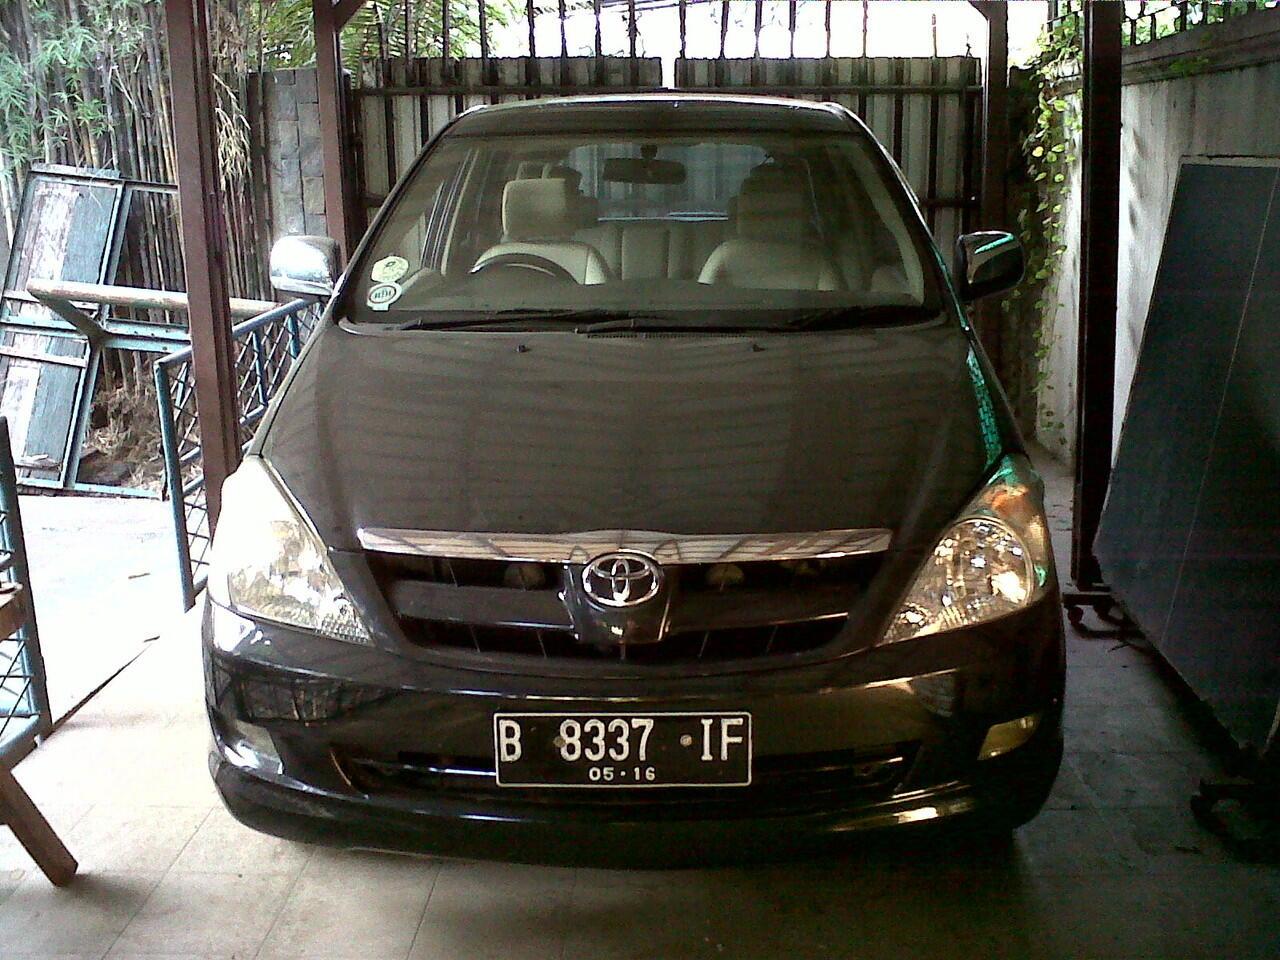 Toyota Kijang Inova type V 2006 Automatic (ex.Dokter)